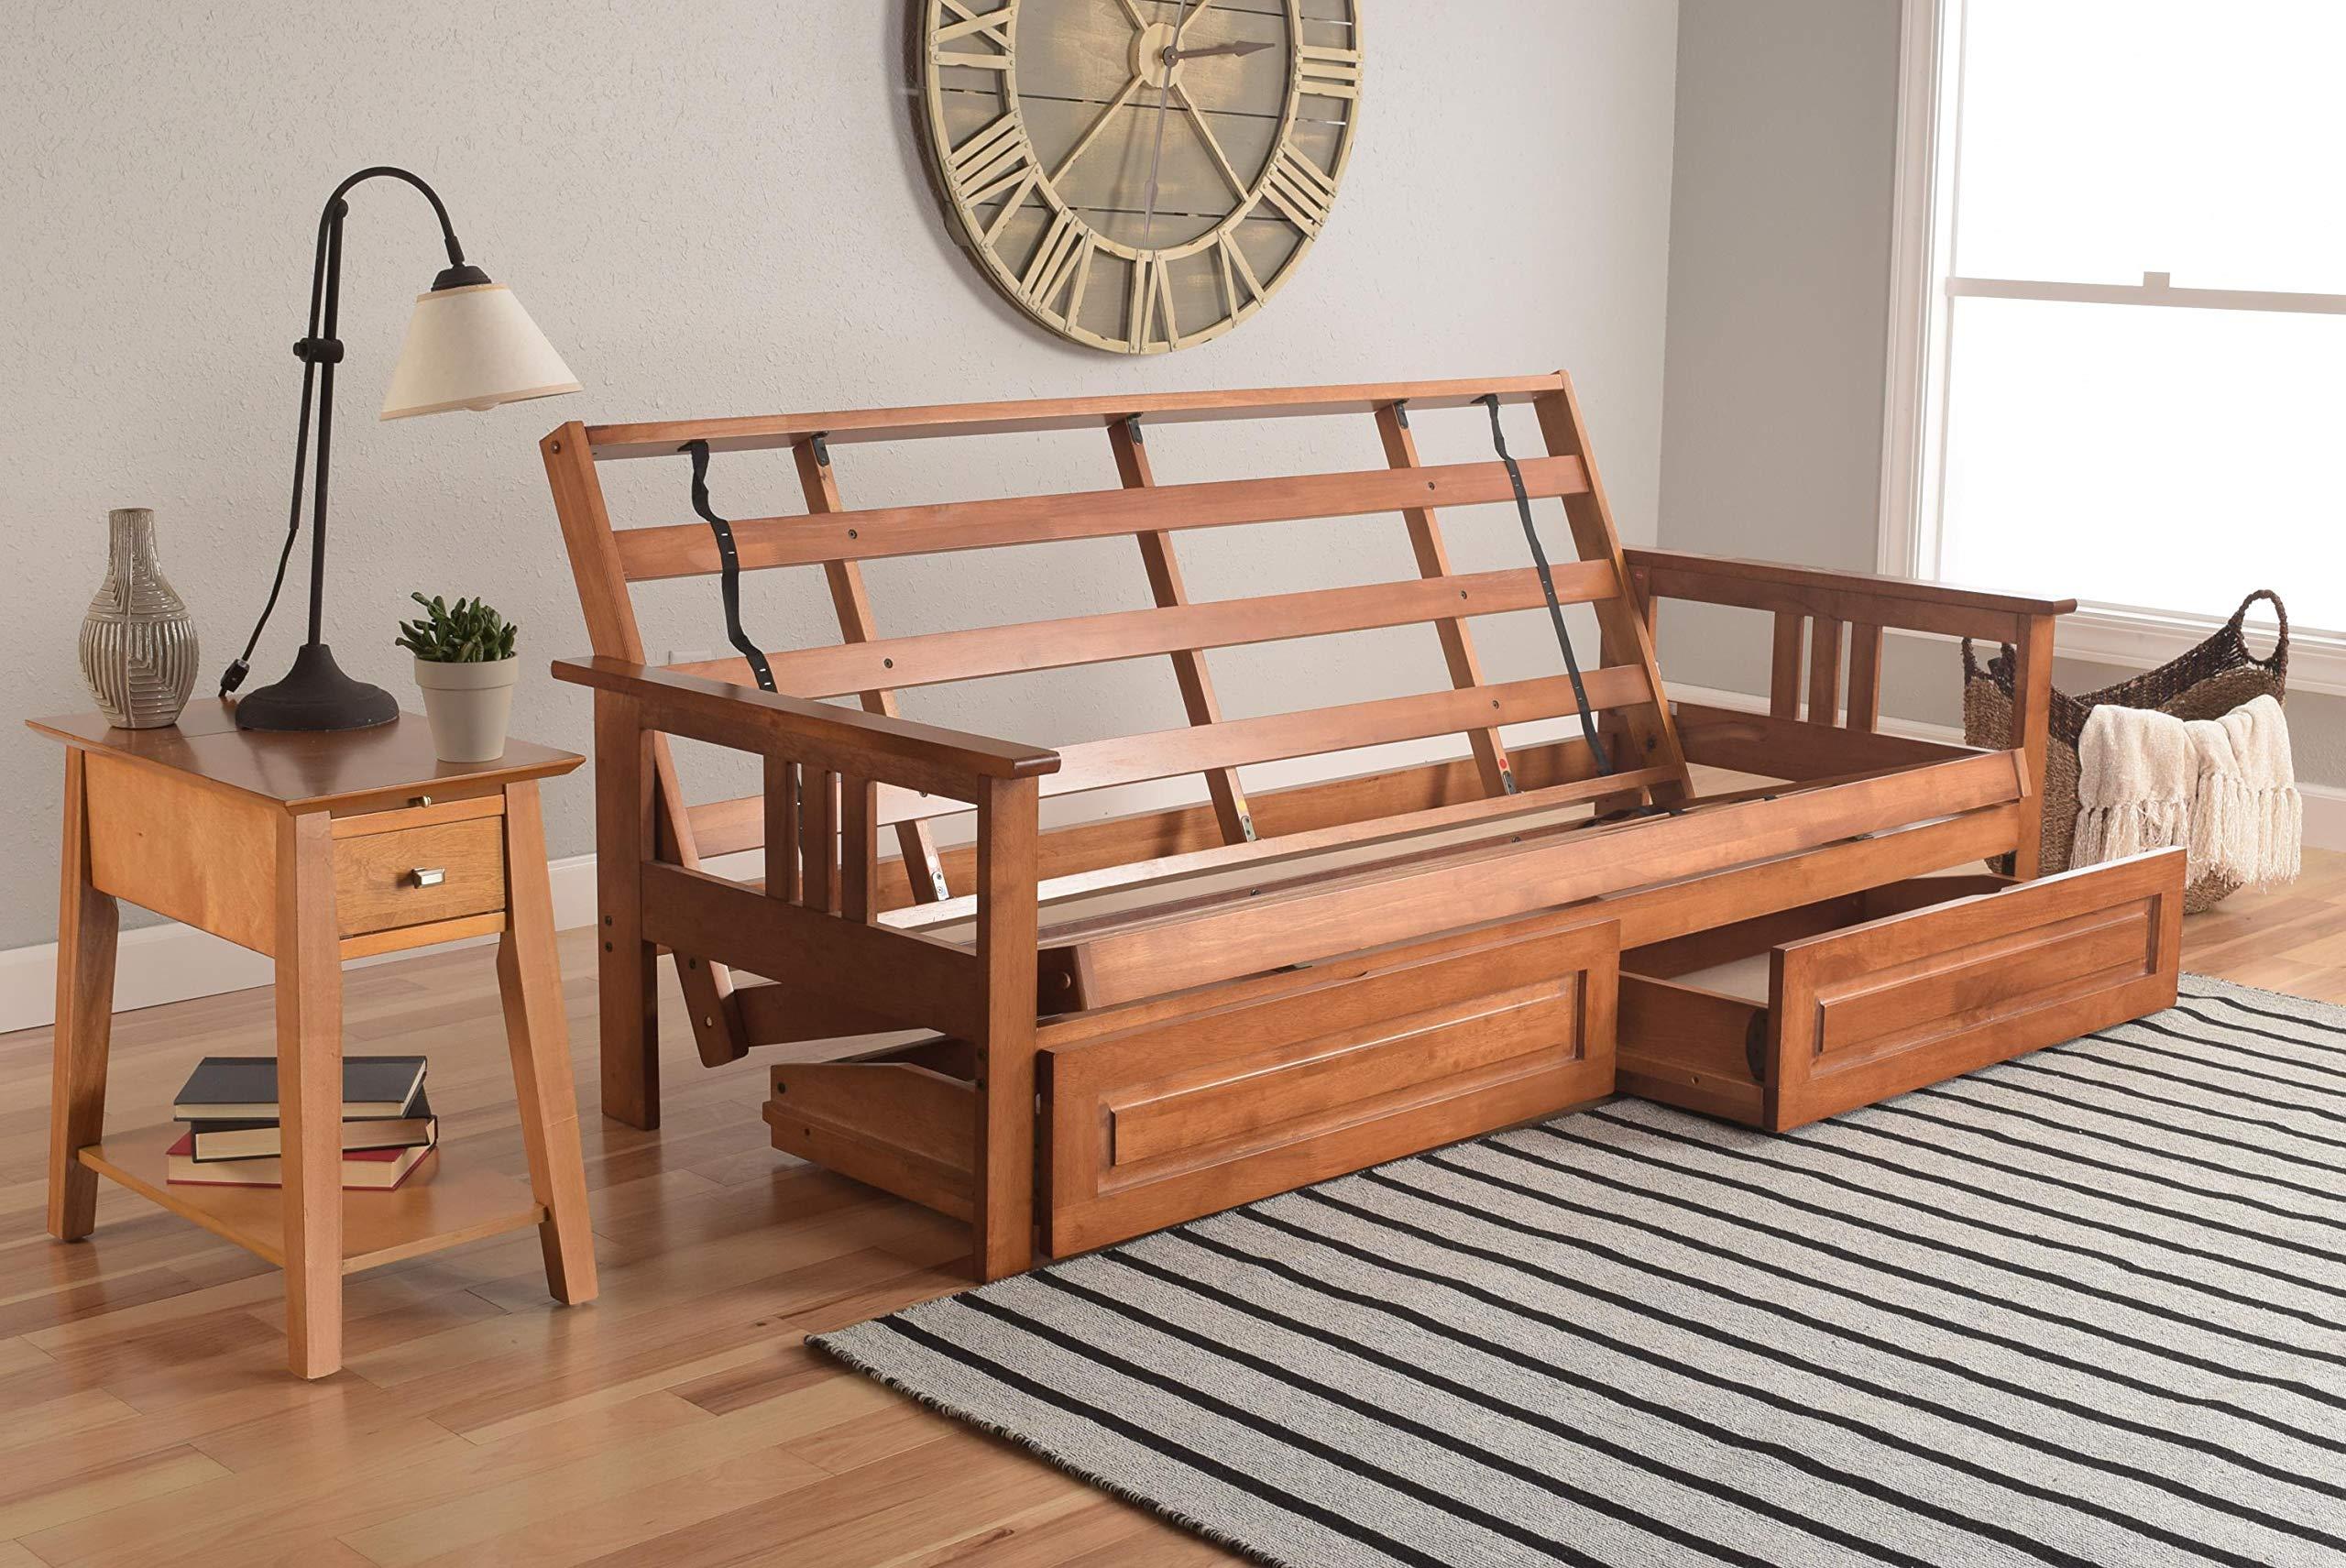 Monterey Futon Sofa in Barbados Finish with Storage Drawers by Kodiak Futons